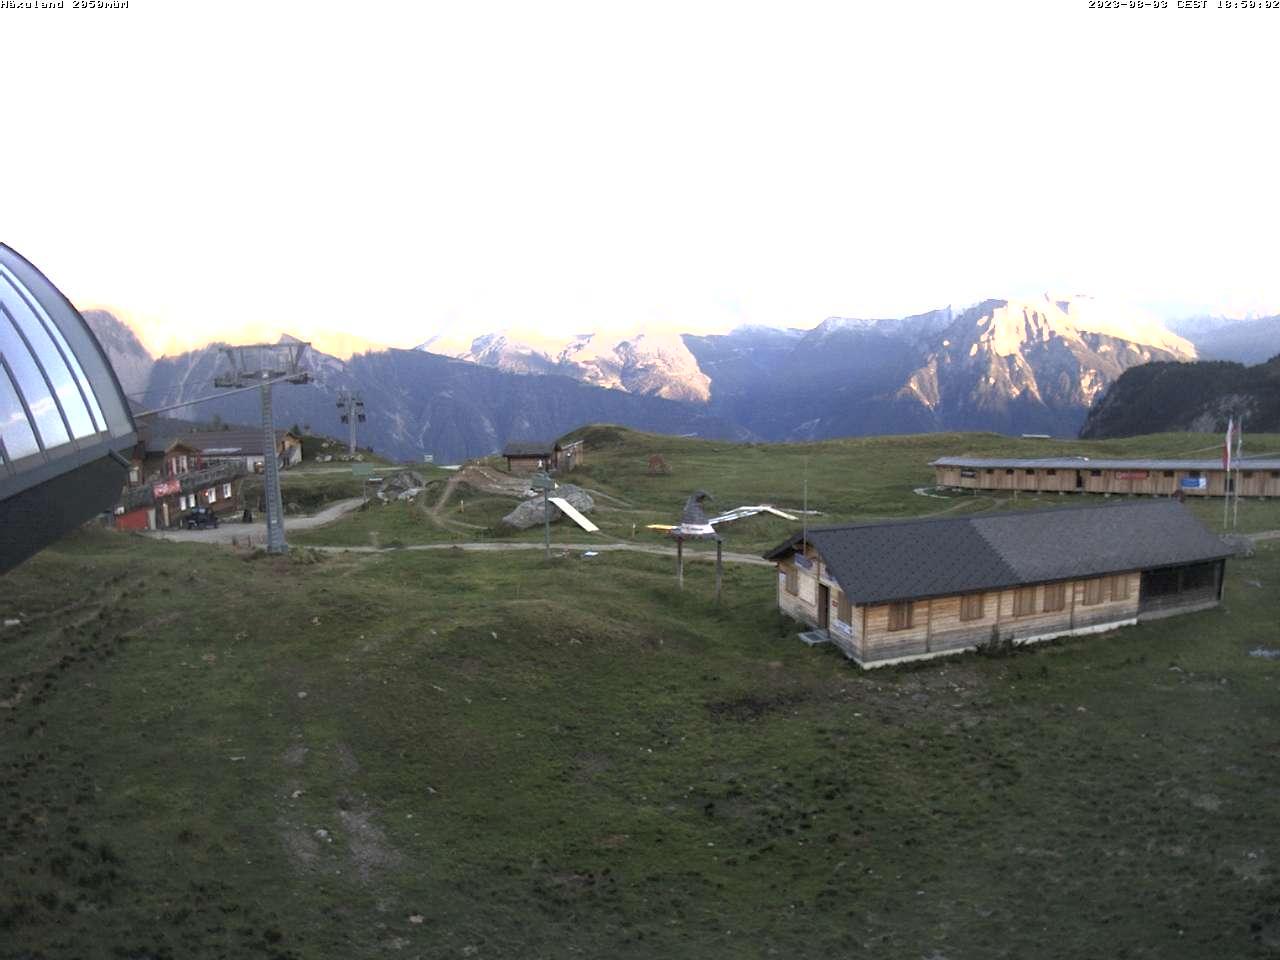 Standort, Bergstation Chiematte 2047 m.ü.M